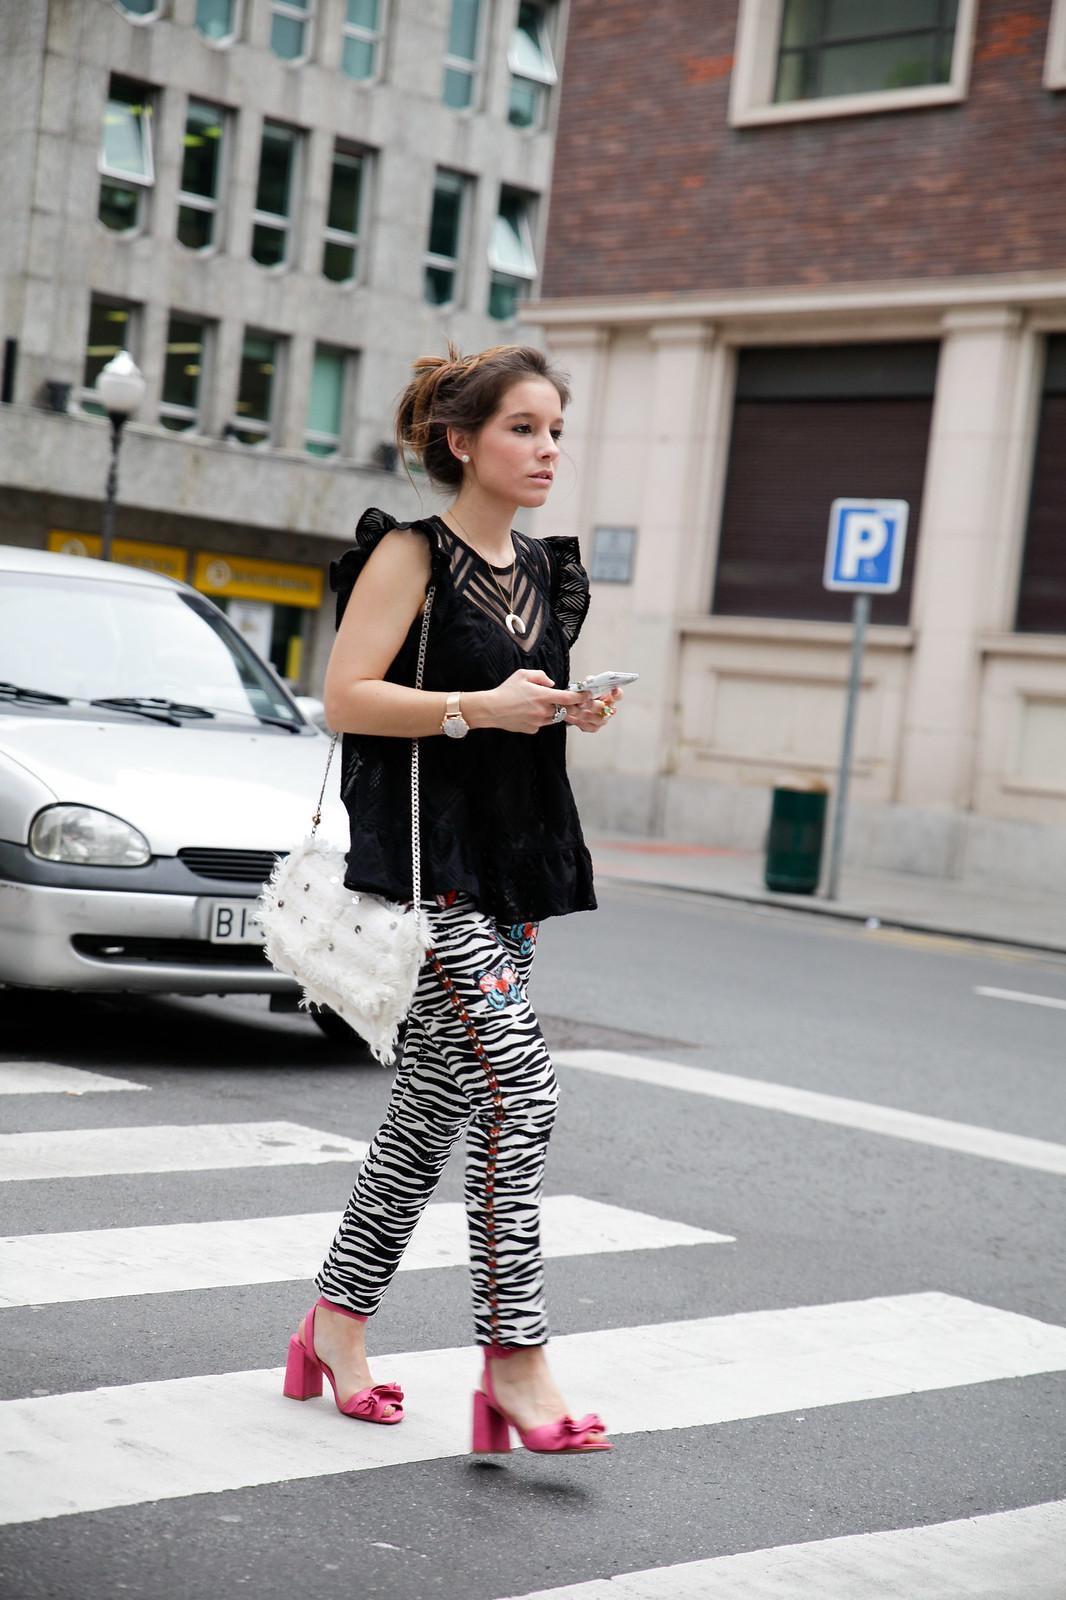 012_Pantalones_Zebra_Blusa_Boho_tacones_rosas_stradivarius_Theguestgirl_outfit_barcelona_streetstyle